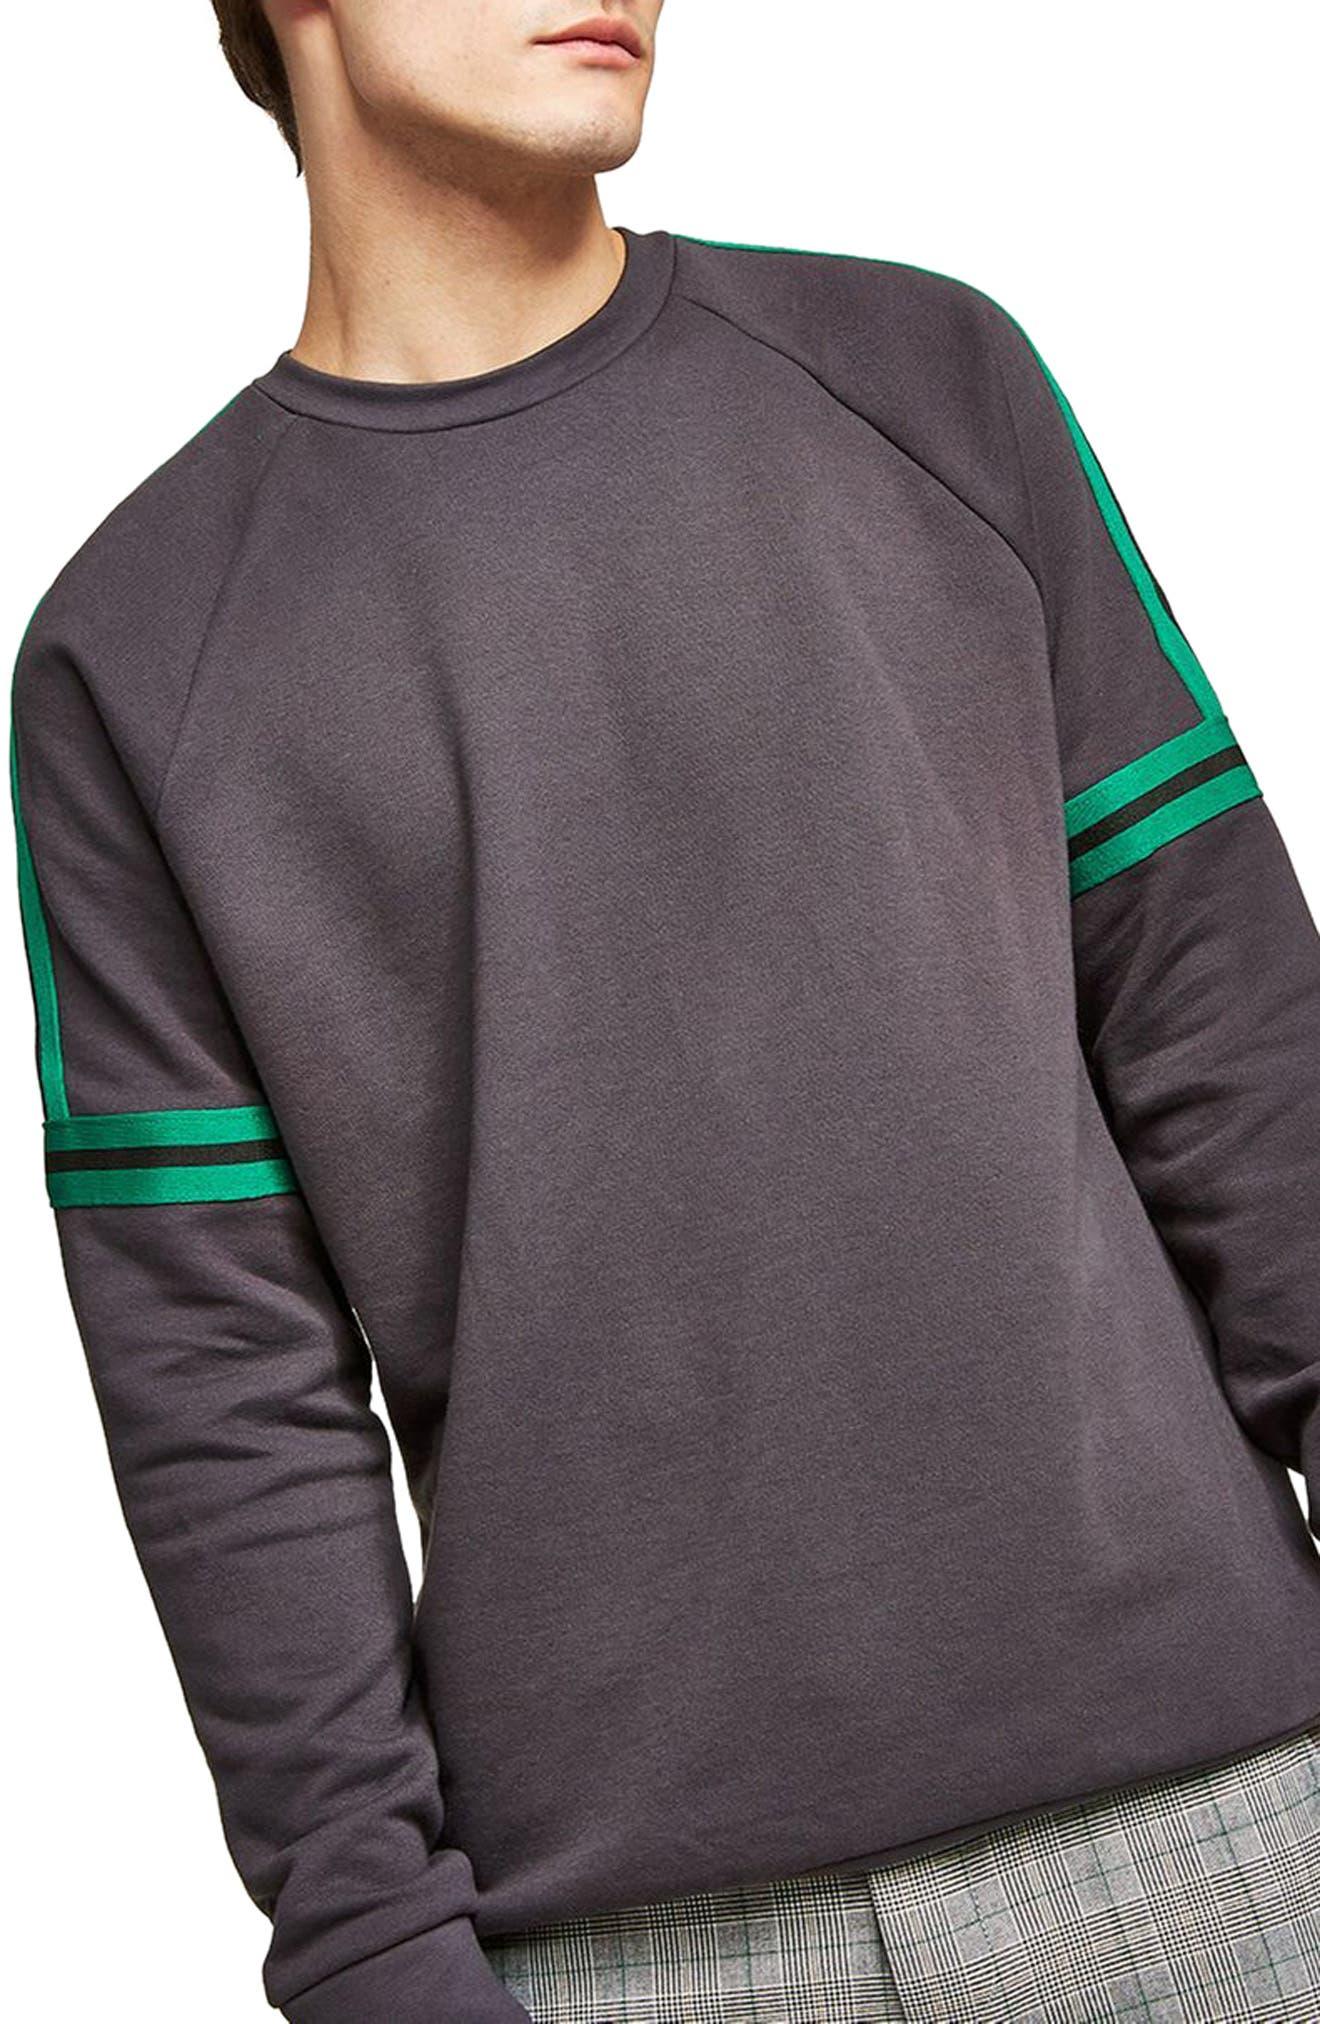 Tape Crewneck Sweatshirt,                             Main thumbnail 1, color,                             Grey Multi